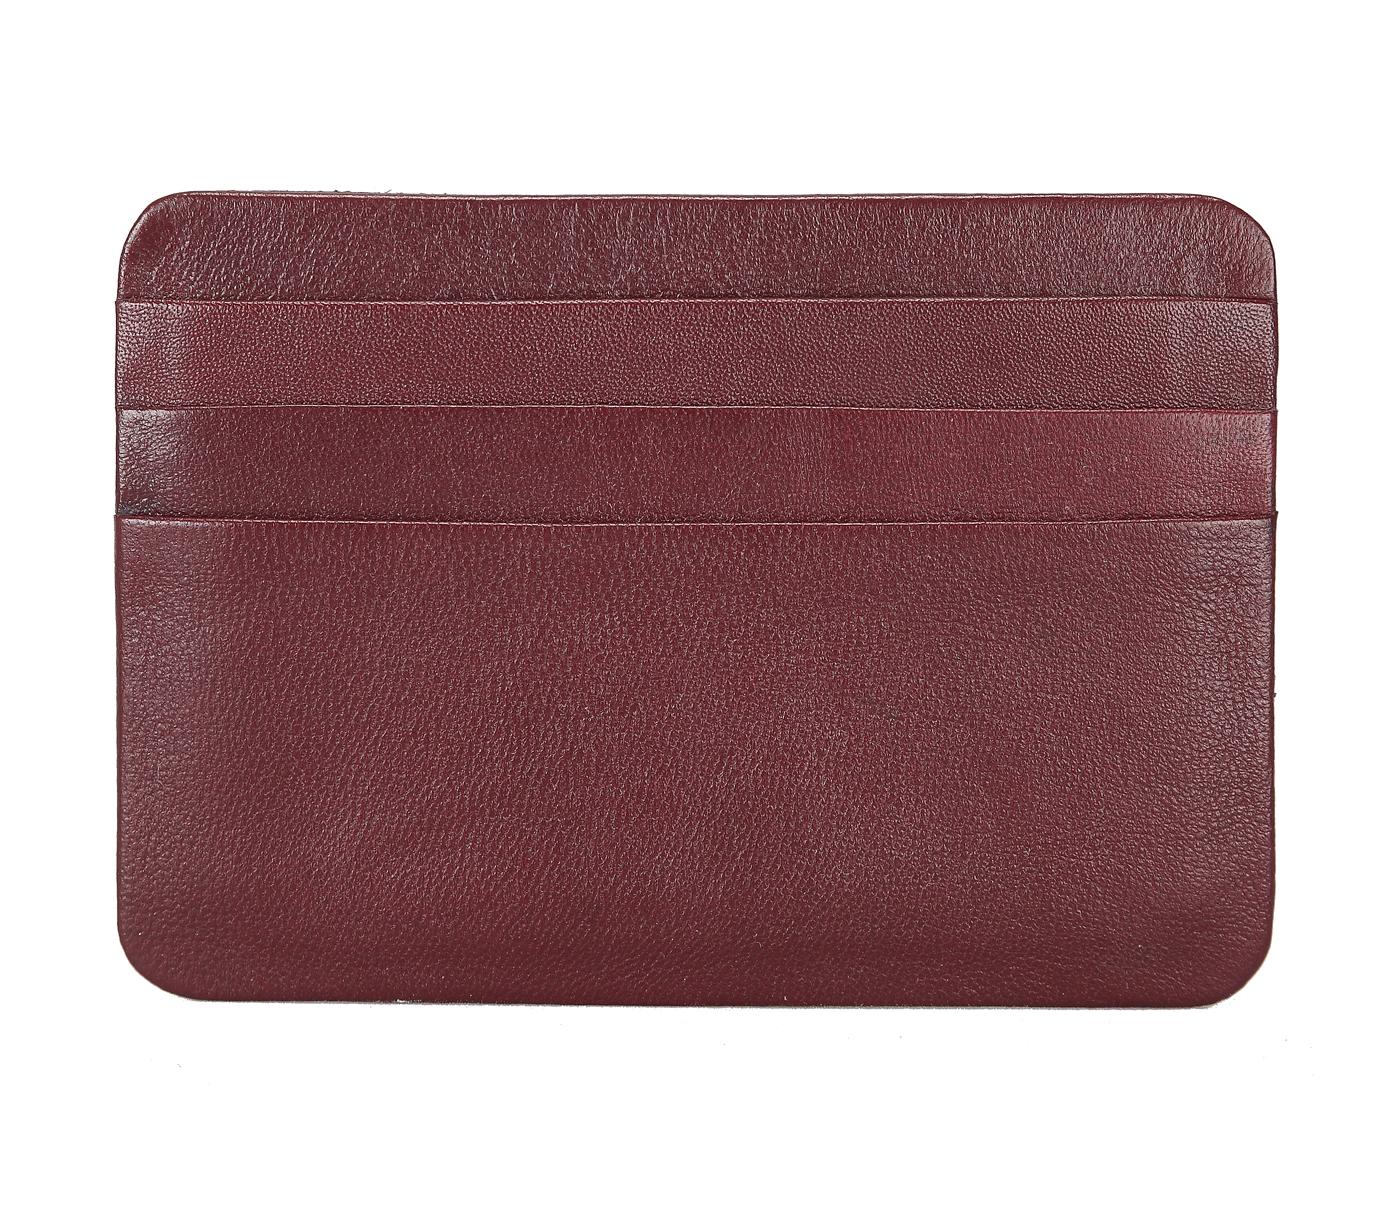 VW8--Ultra Slim card Case in Genuine Leather - Wine